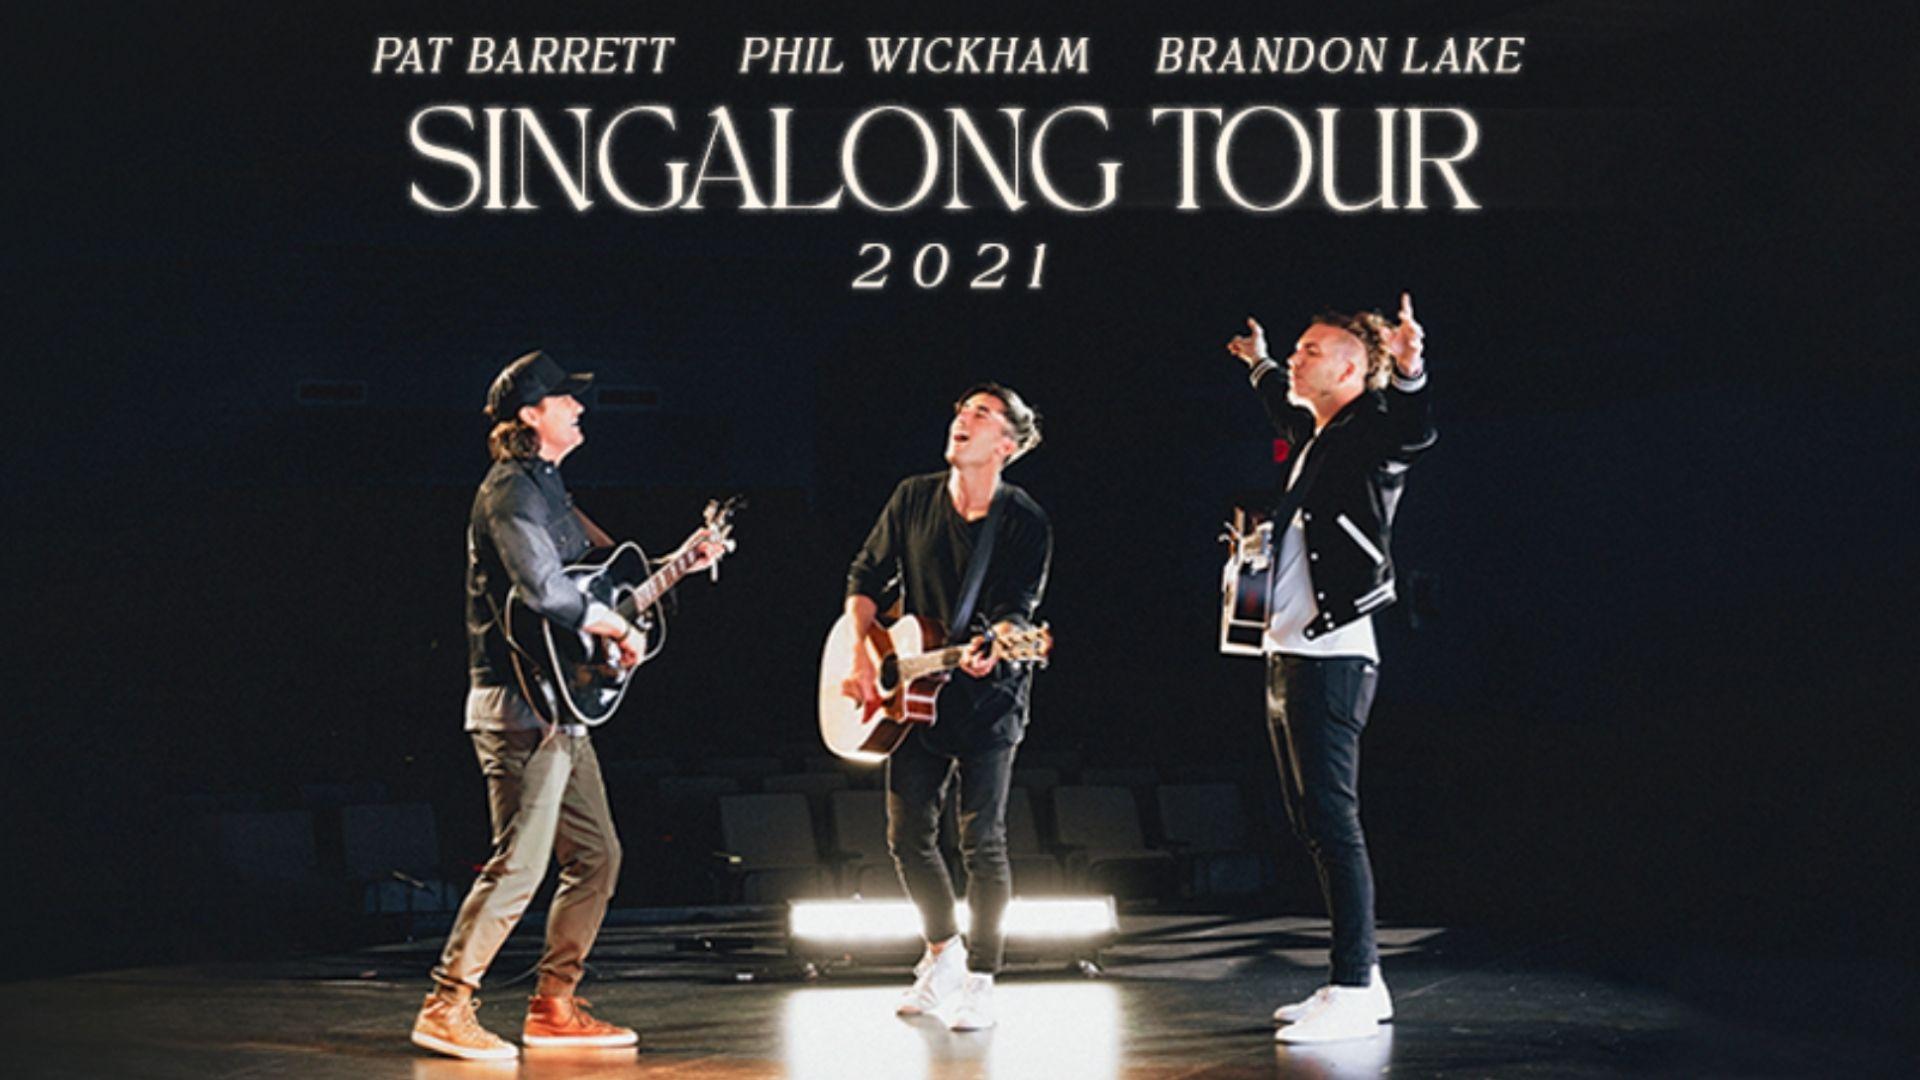 Phil Wickham, Pat Barrett & Brandon Lake at Tennessee Performing Arts Center